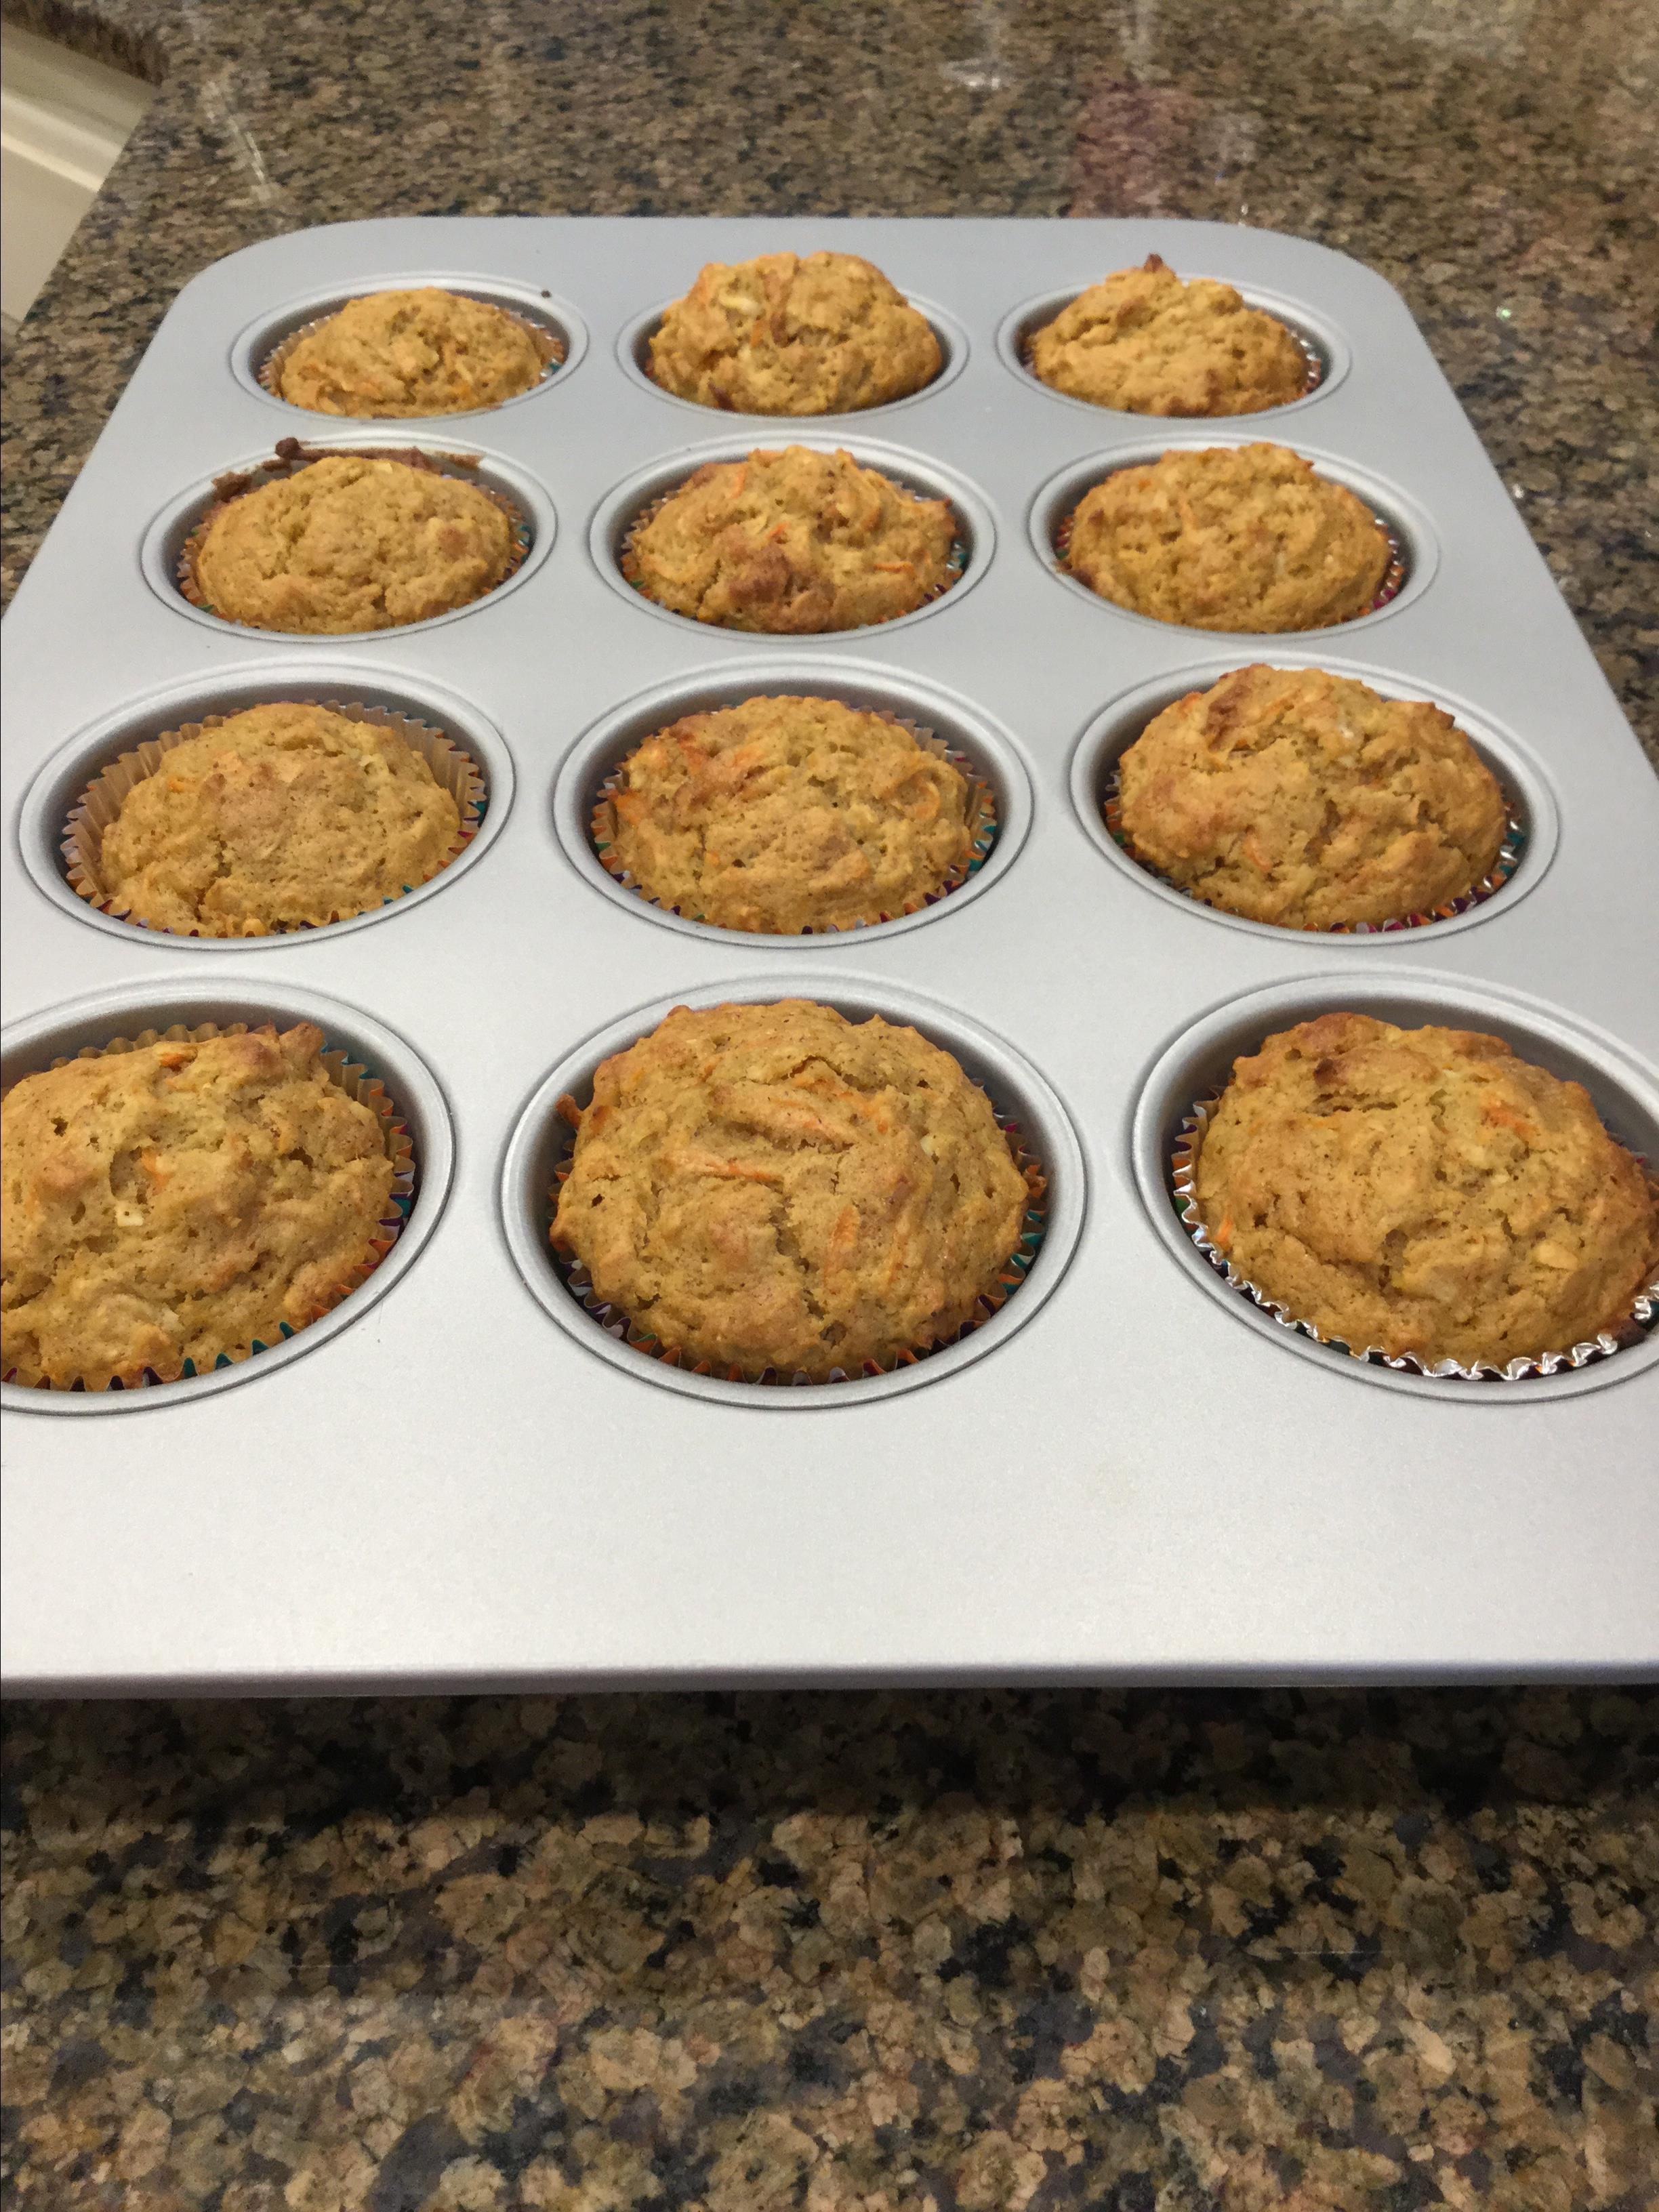 Carrot Morning Glory Muffins (Gluten Free Optional) amyg479